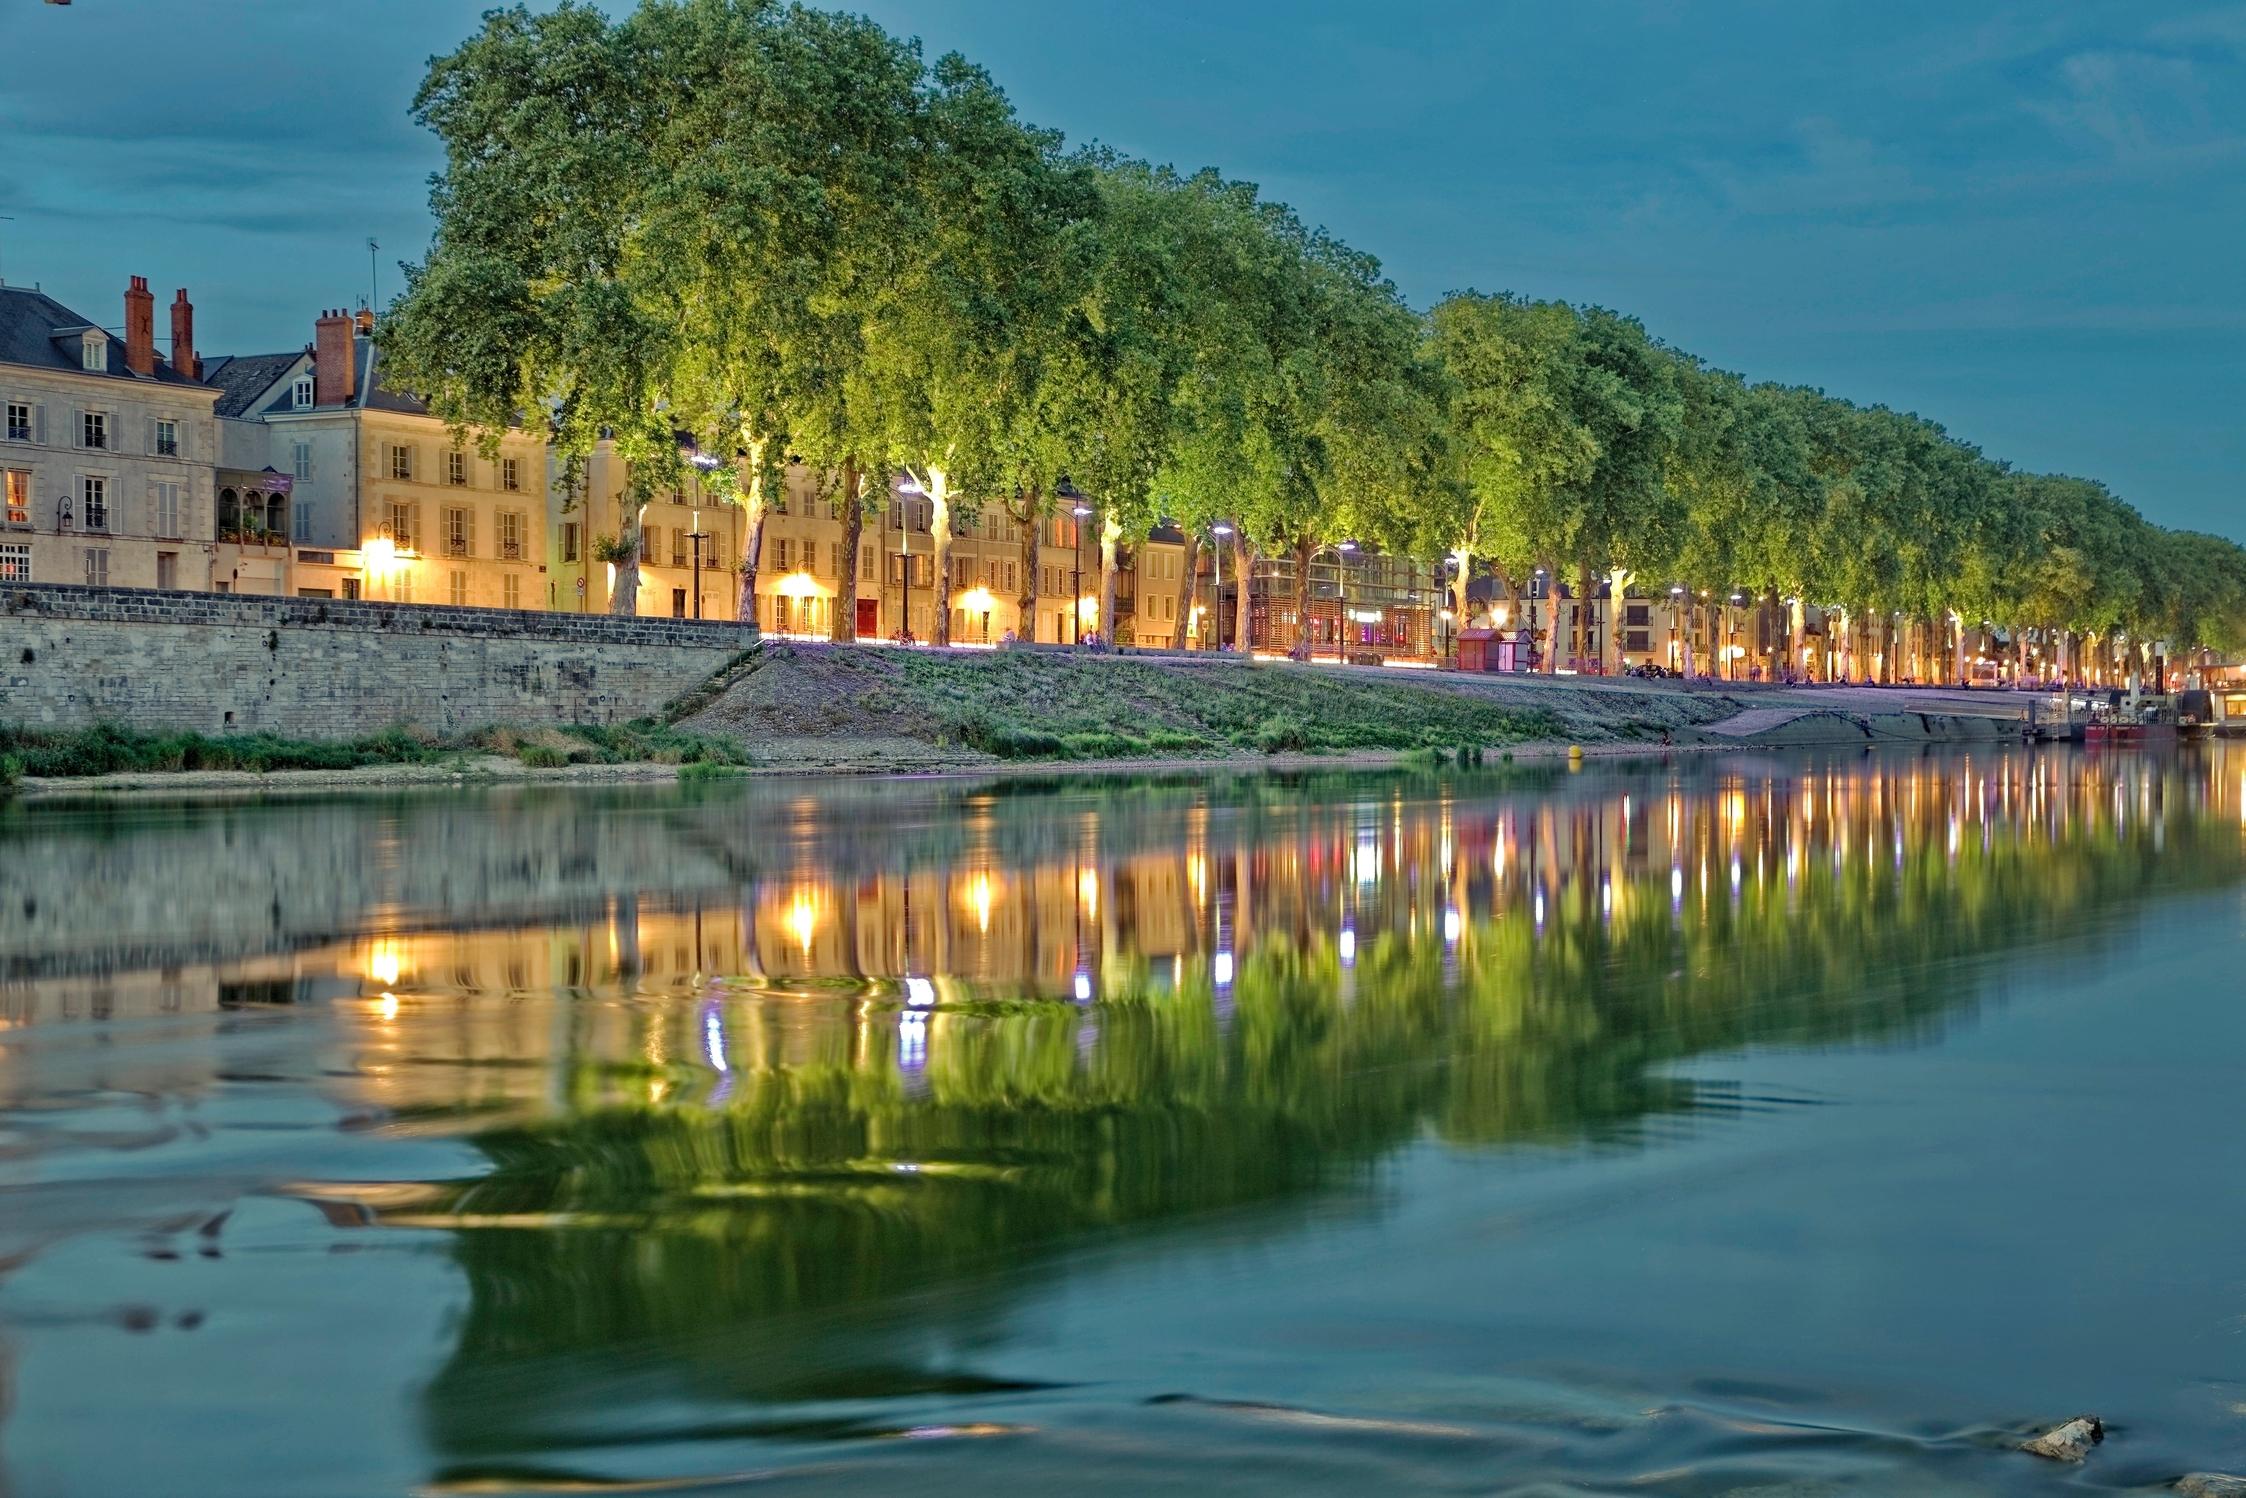 Loire in Orléans